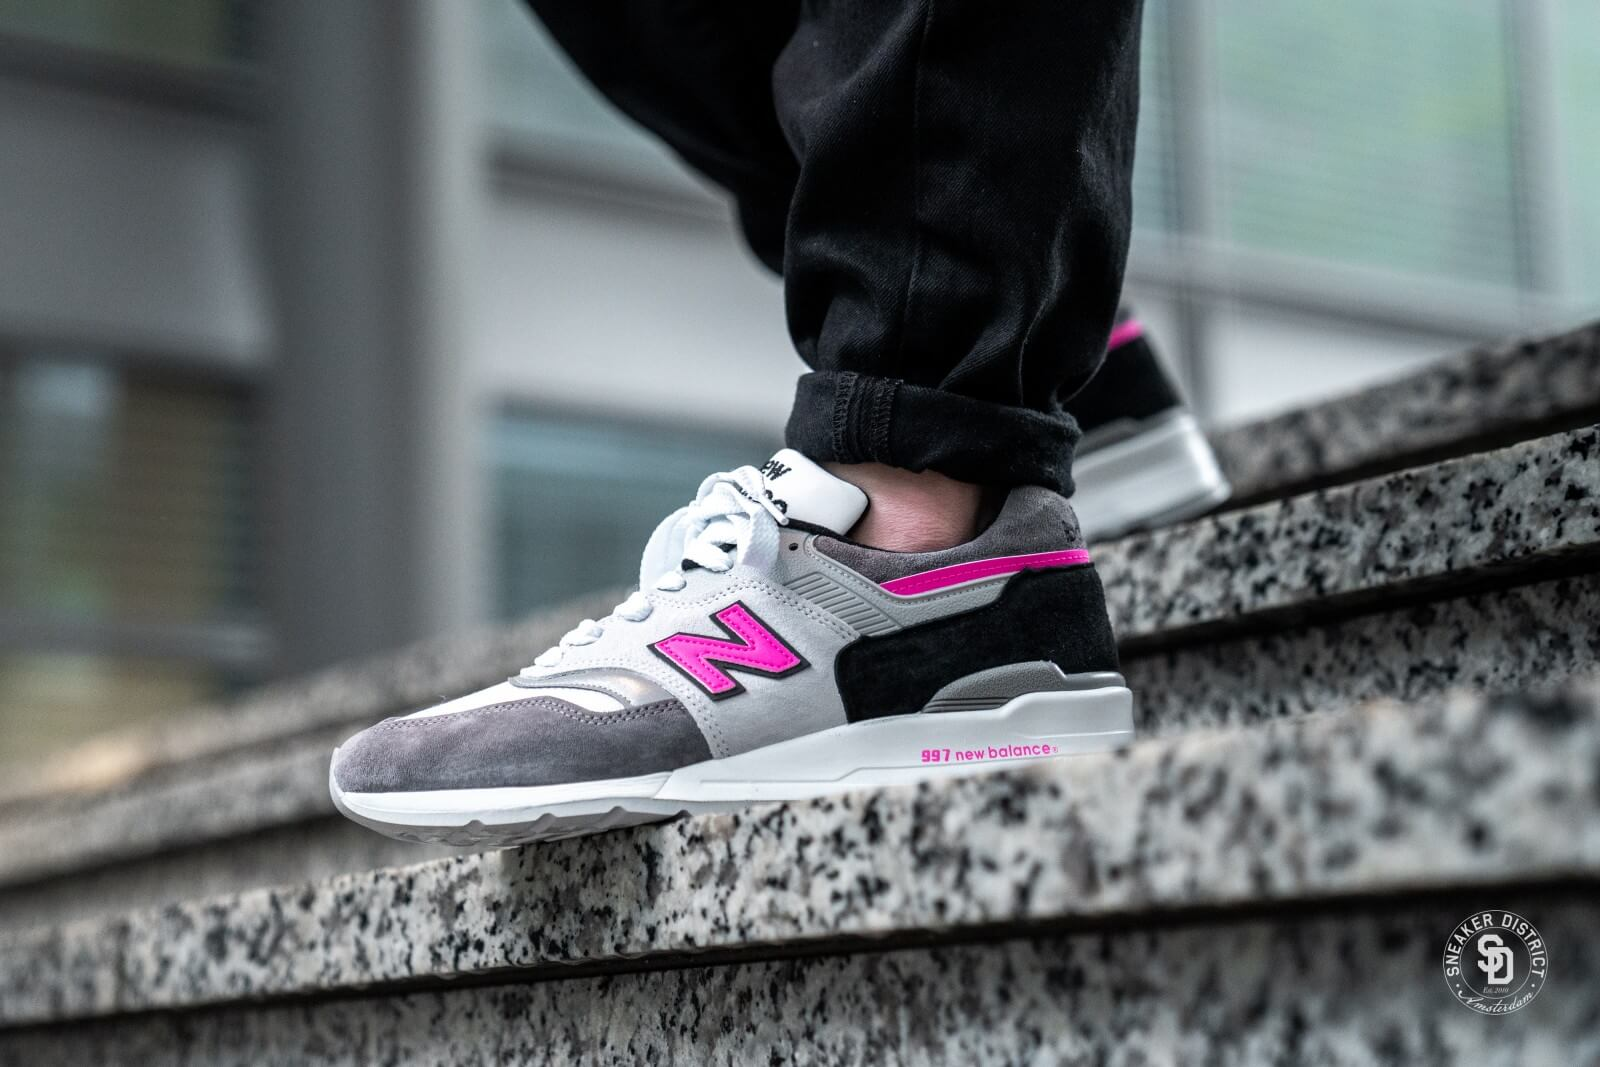 New Balance M997LBK Grey/Pink - 721951-60-123